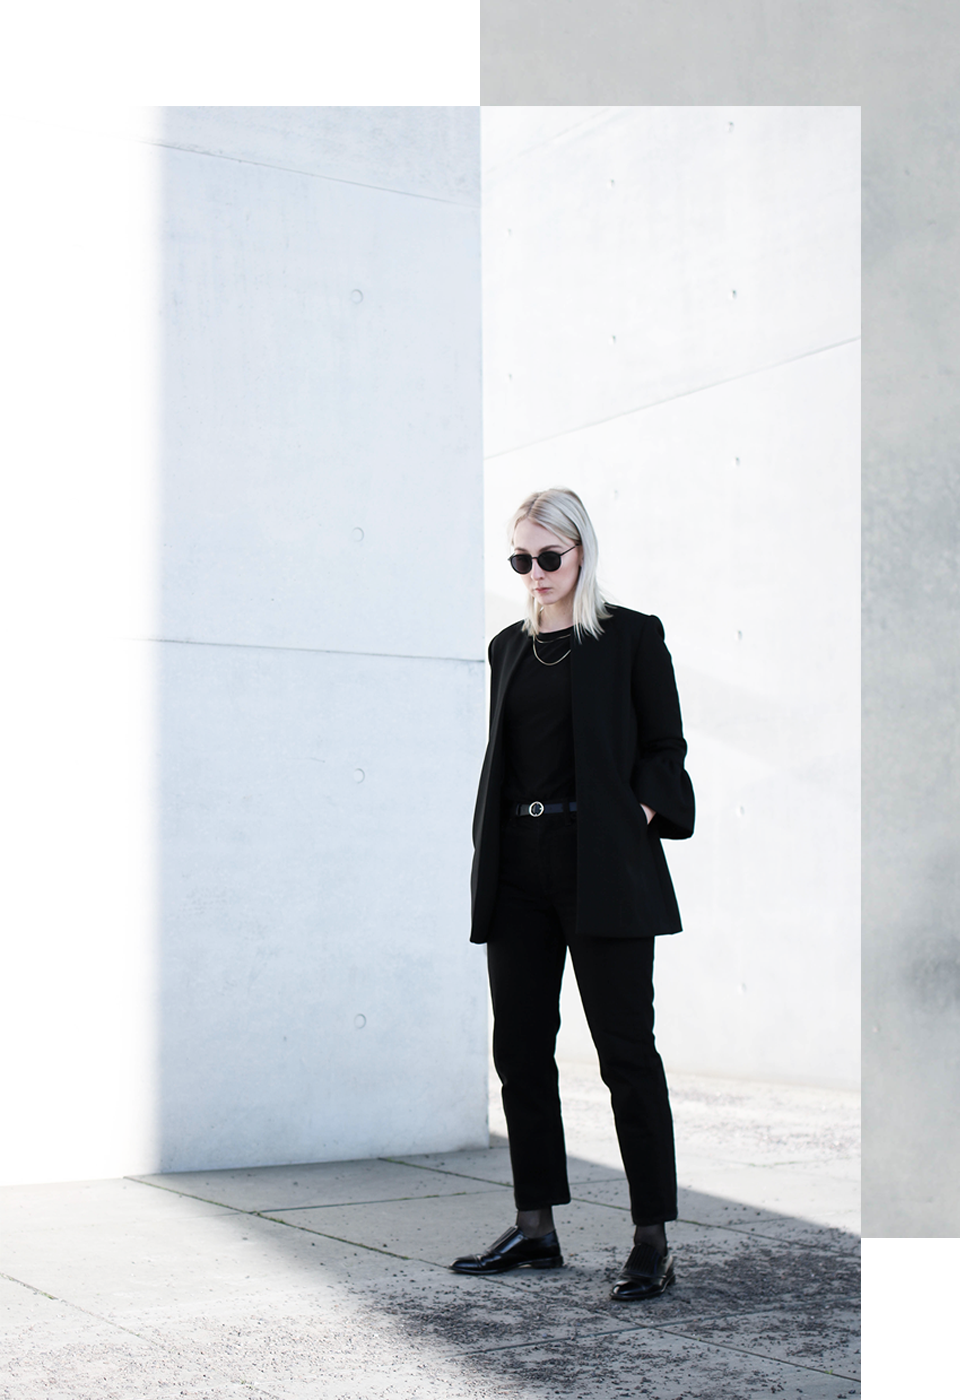 noa-noir-fashion-outfit-all-black-monochrome-minimal-inspiration-architecture-photography-1.png